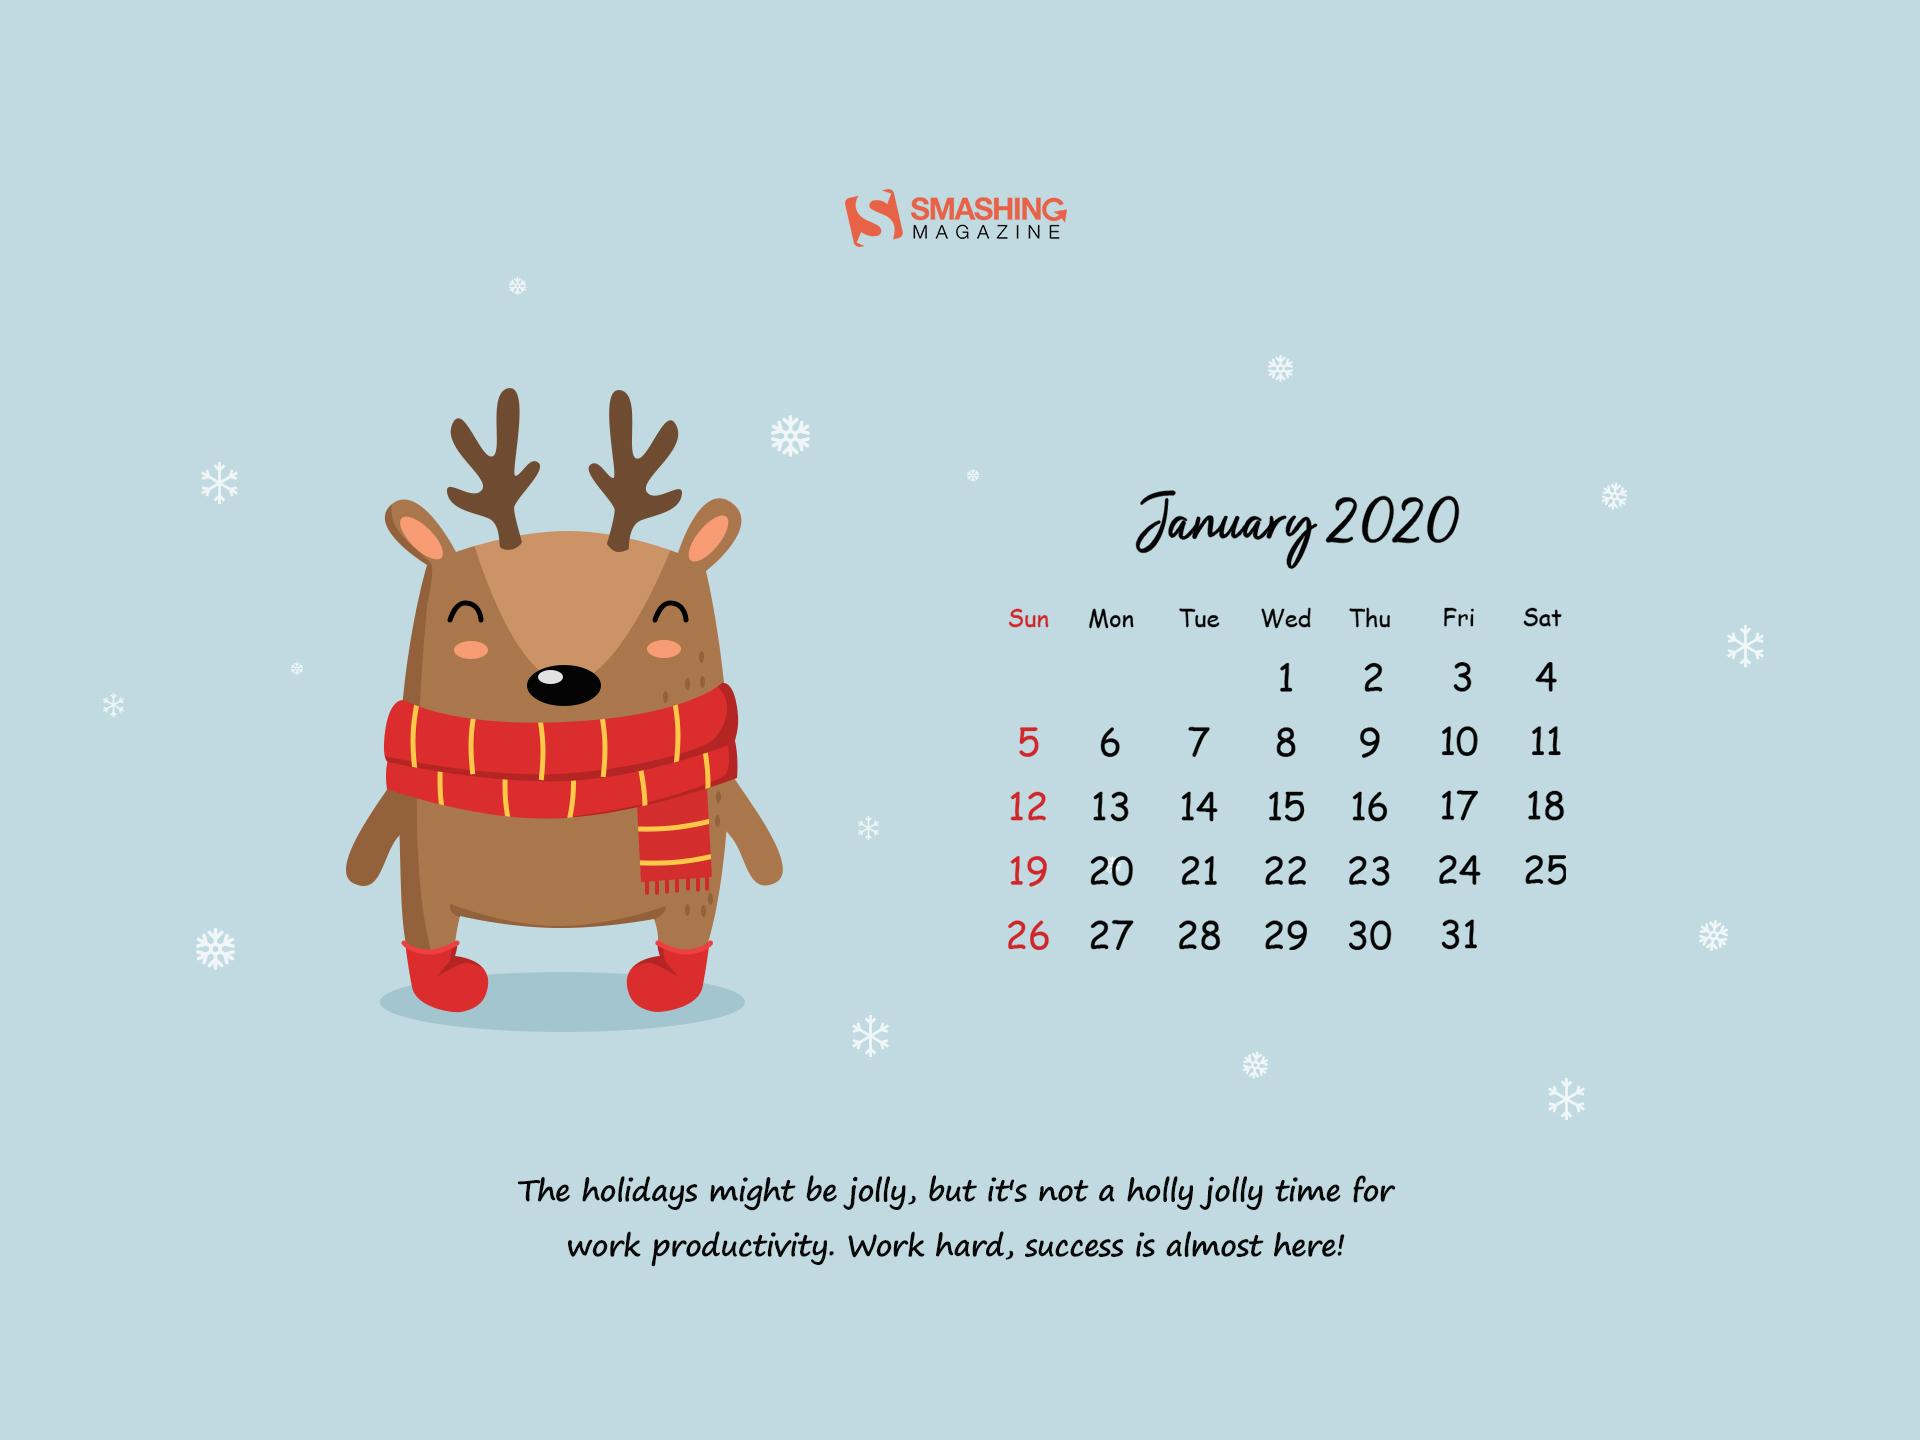 New Adventures Ahead January 2020 Wallpapers Smashing